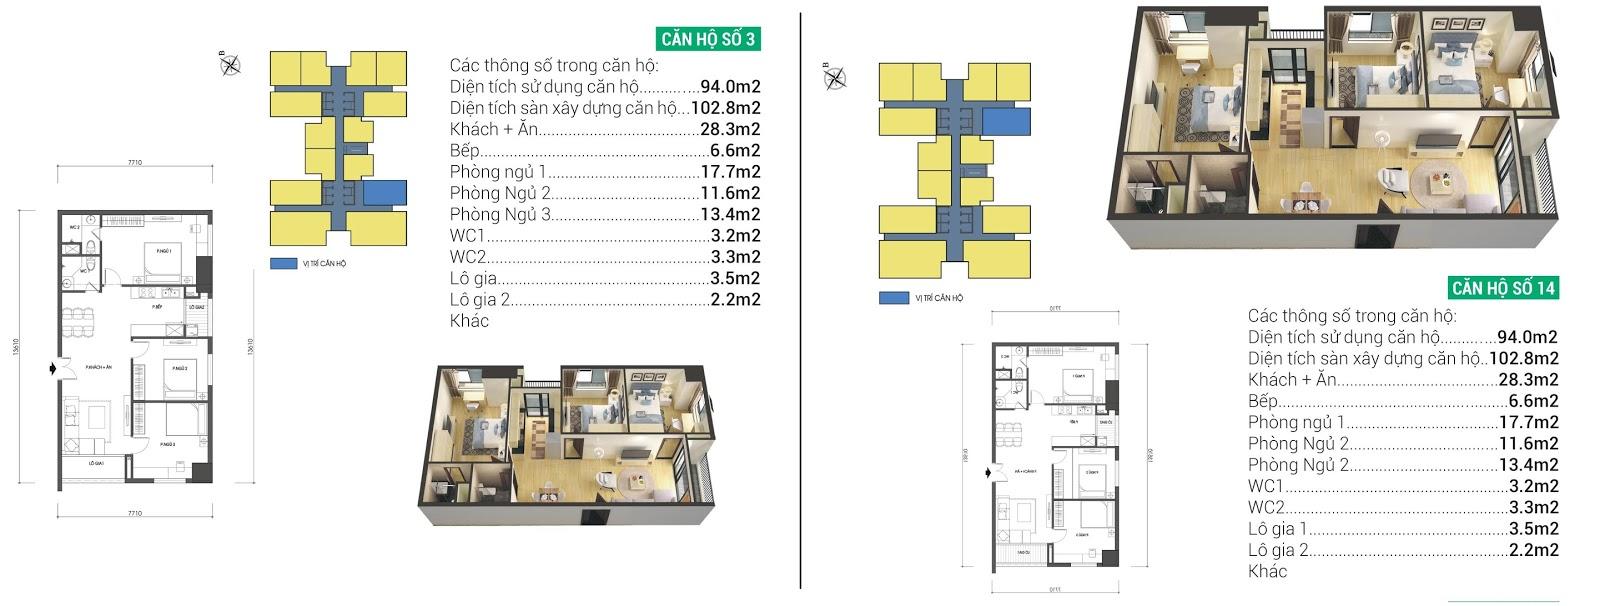 thiết kế căn hộ housinco grand tower